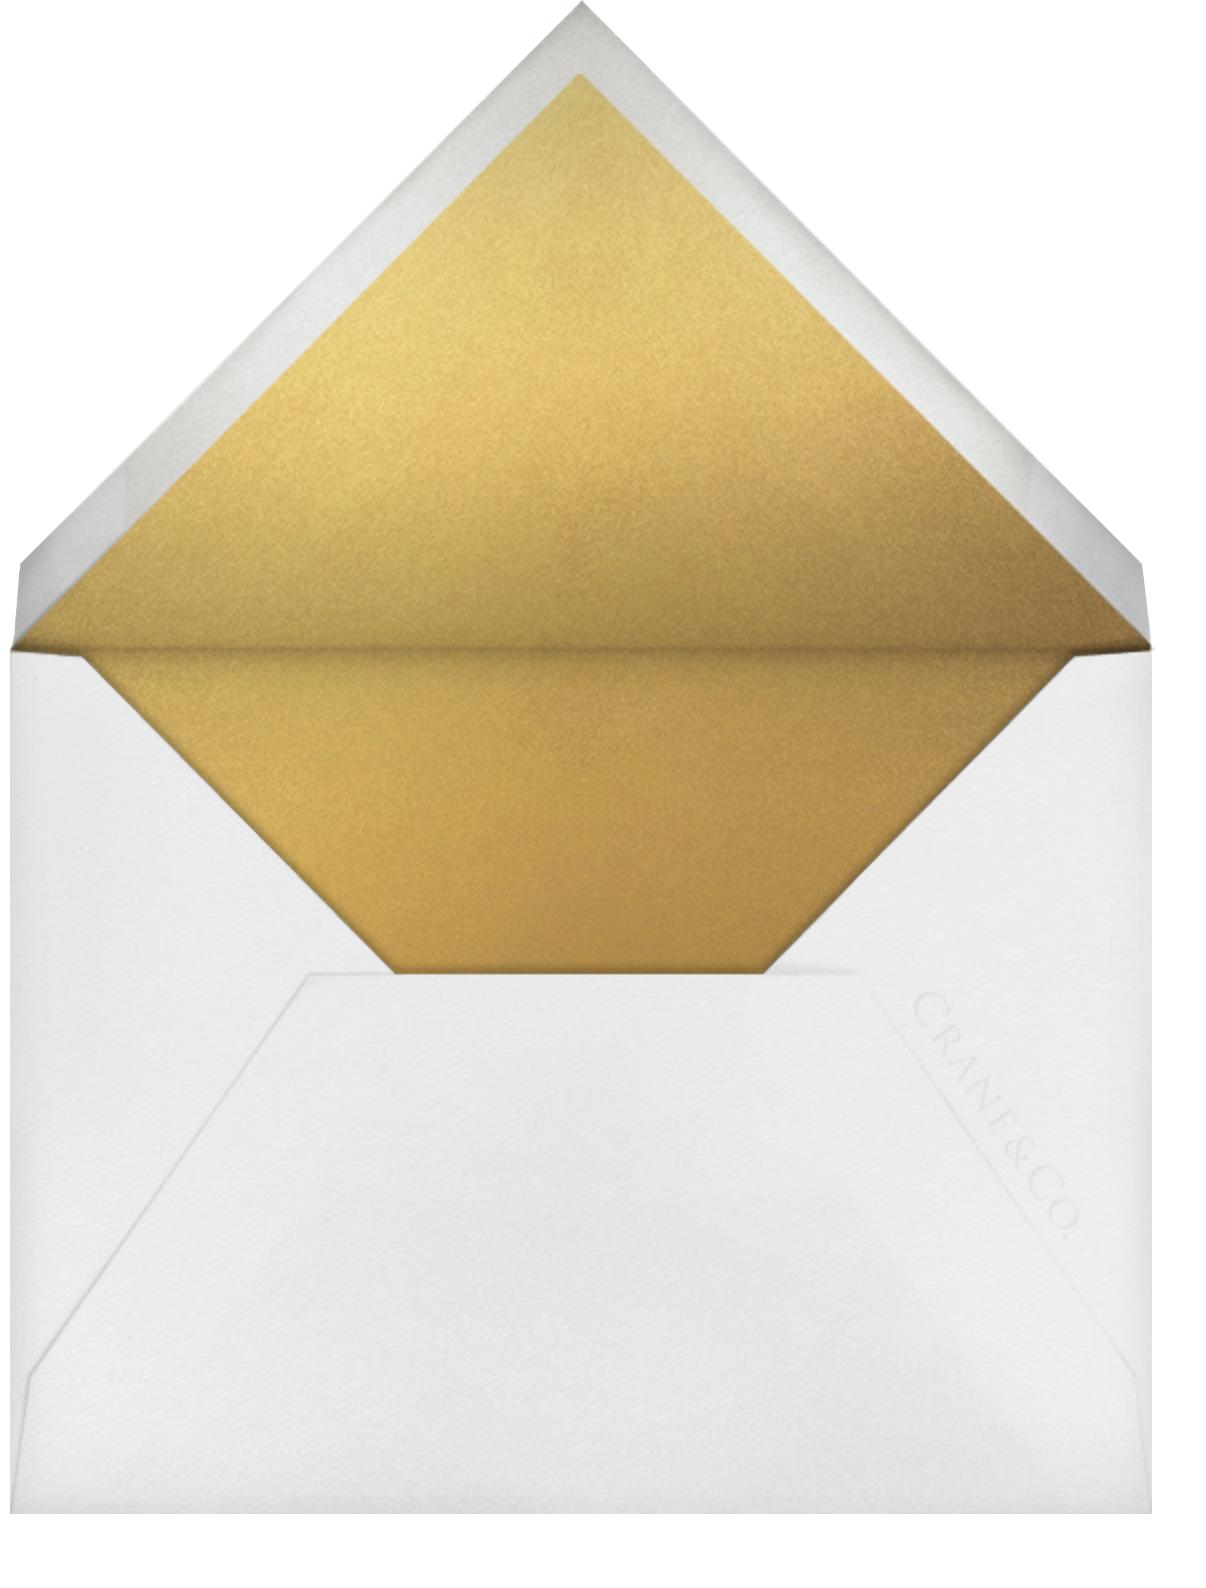 Sargasso (Stationery) - Crane & Co. - Wedding stationery - envelope back